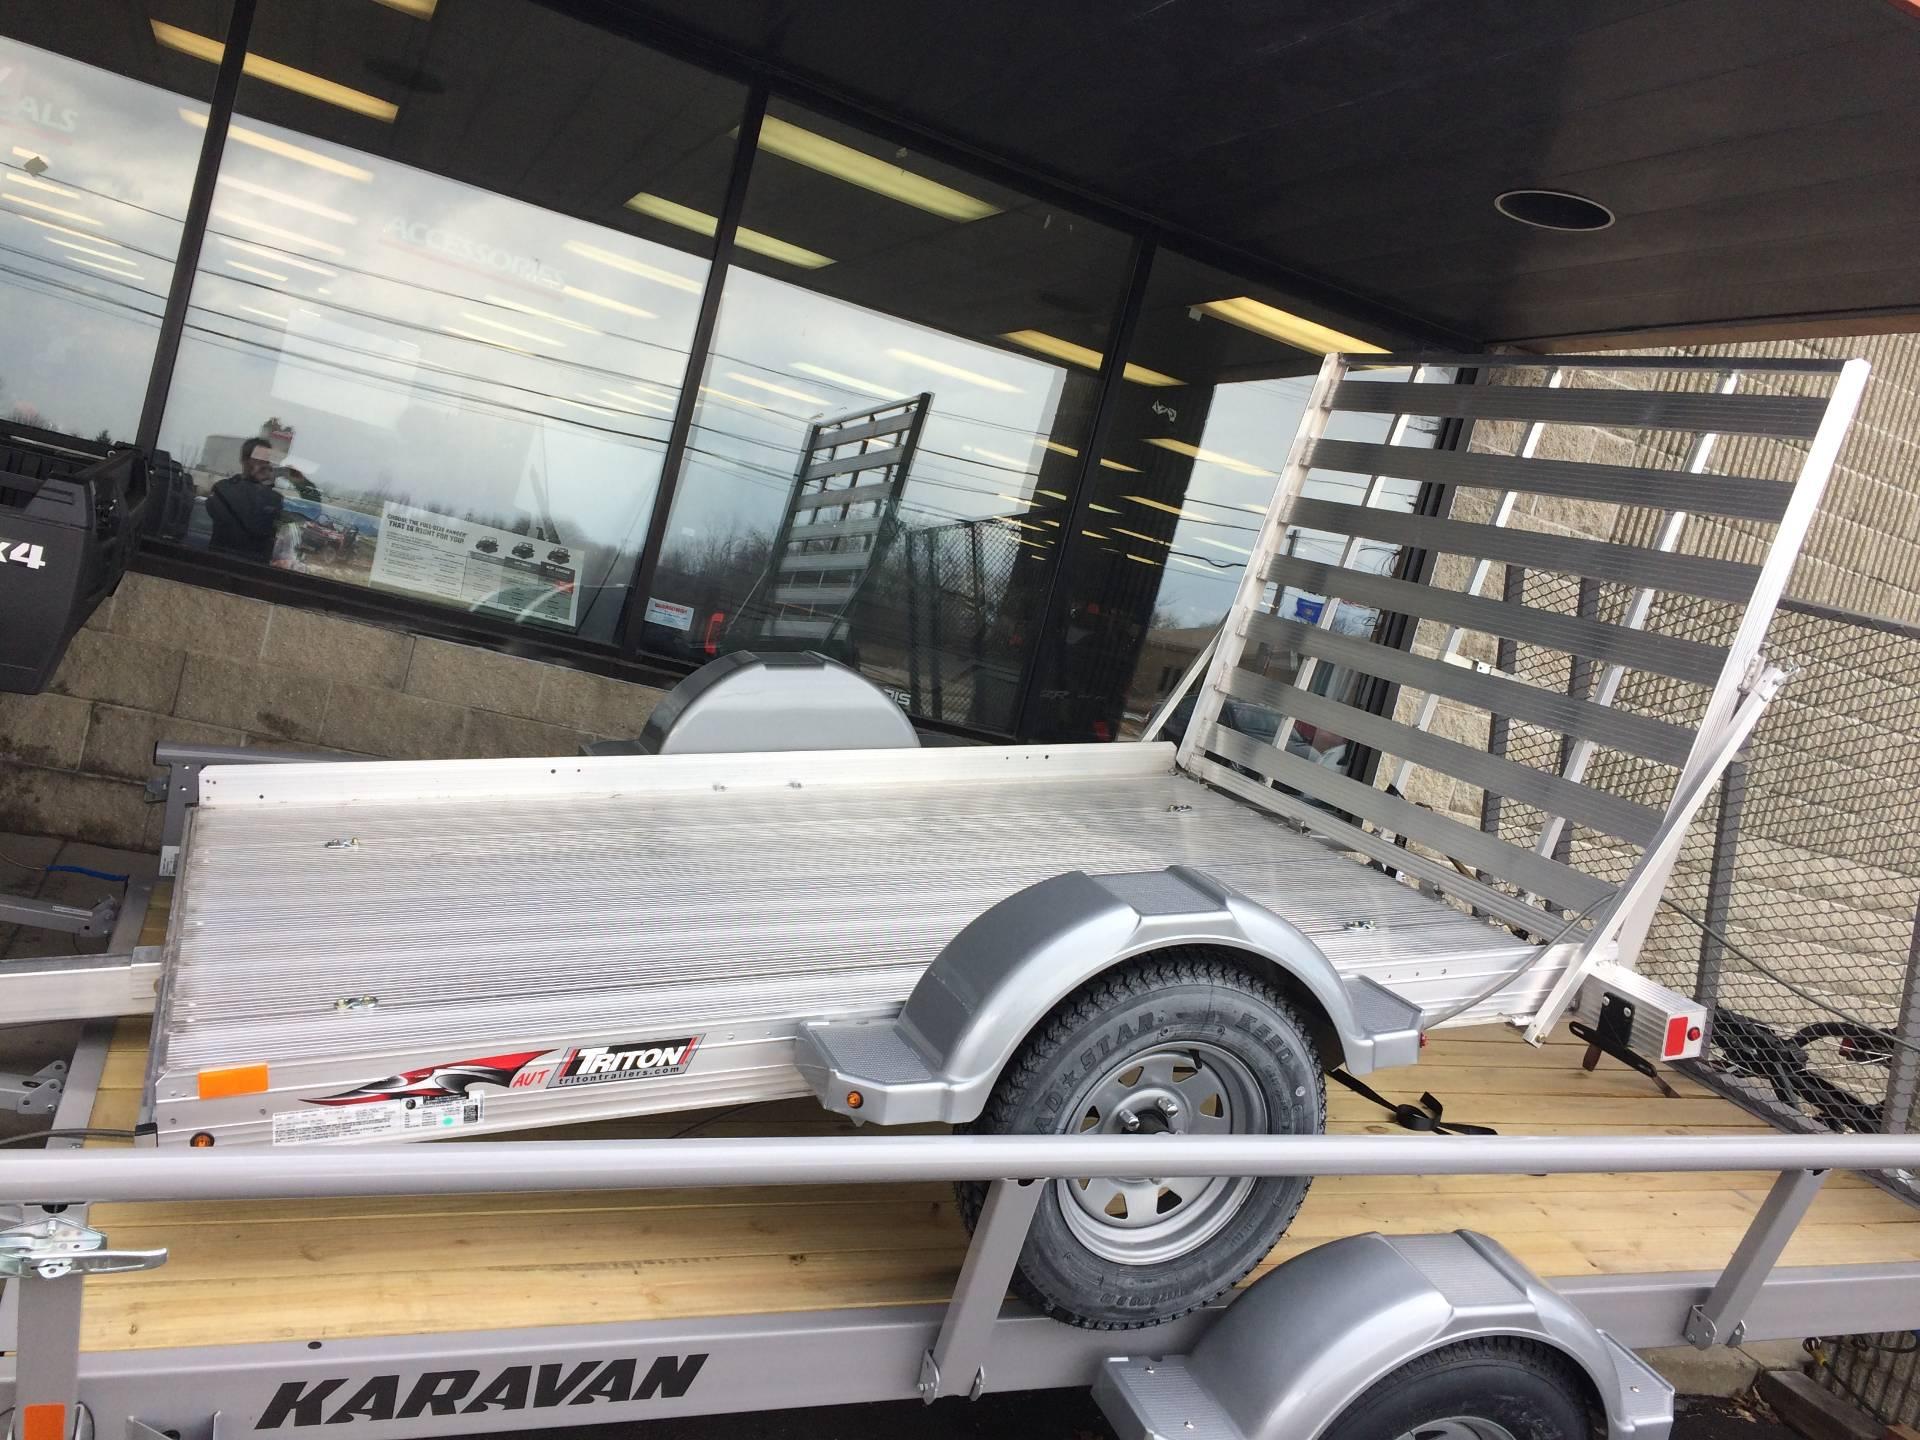 Electrical Wiring Harness Triton Trailers Suzuki Outboard On Boat Trailer Diagram